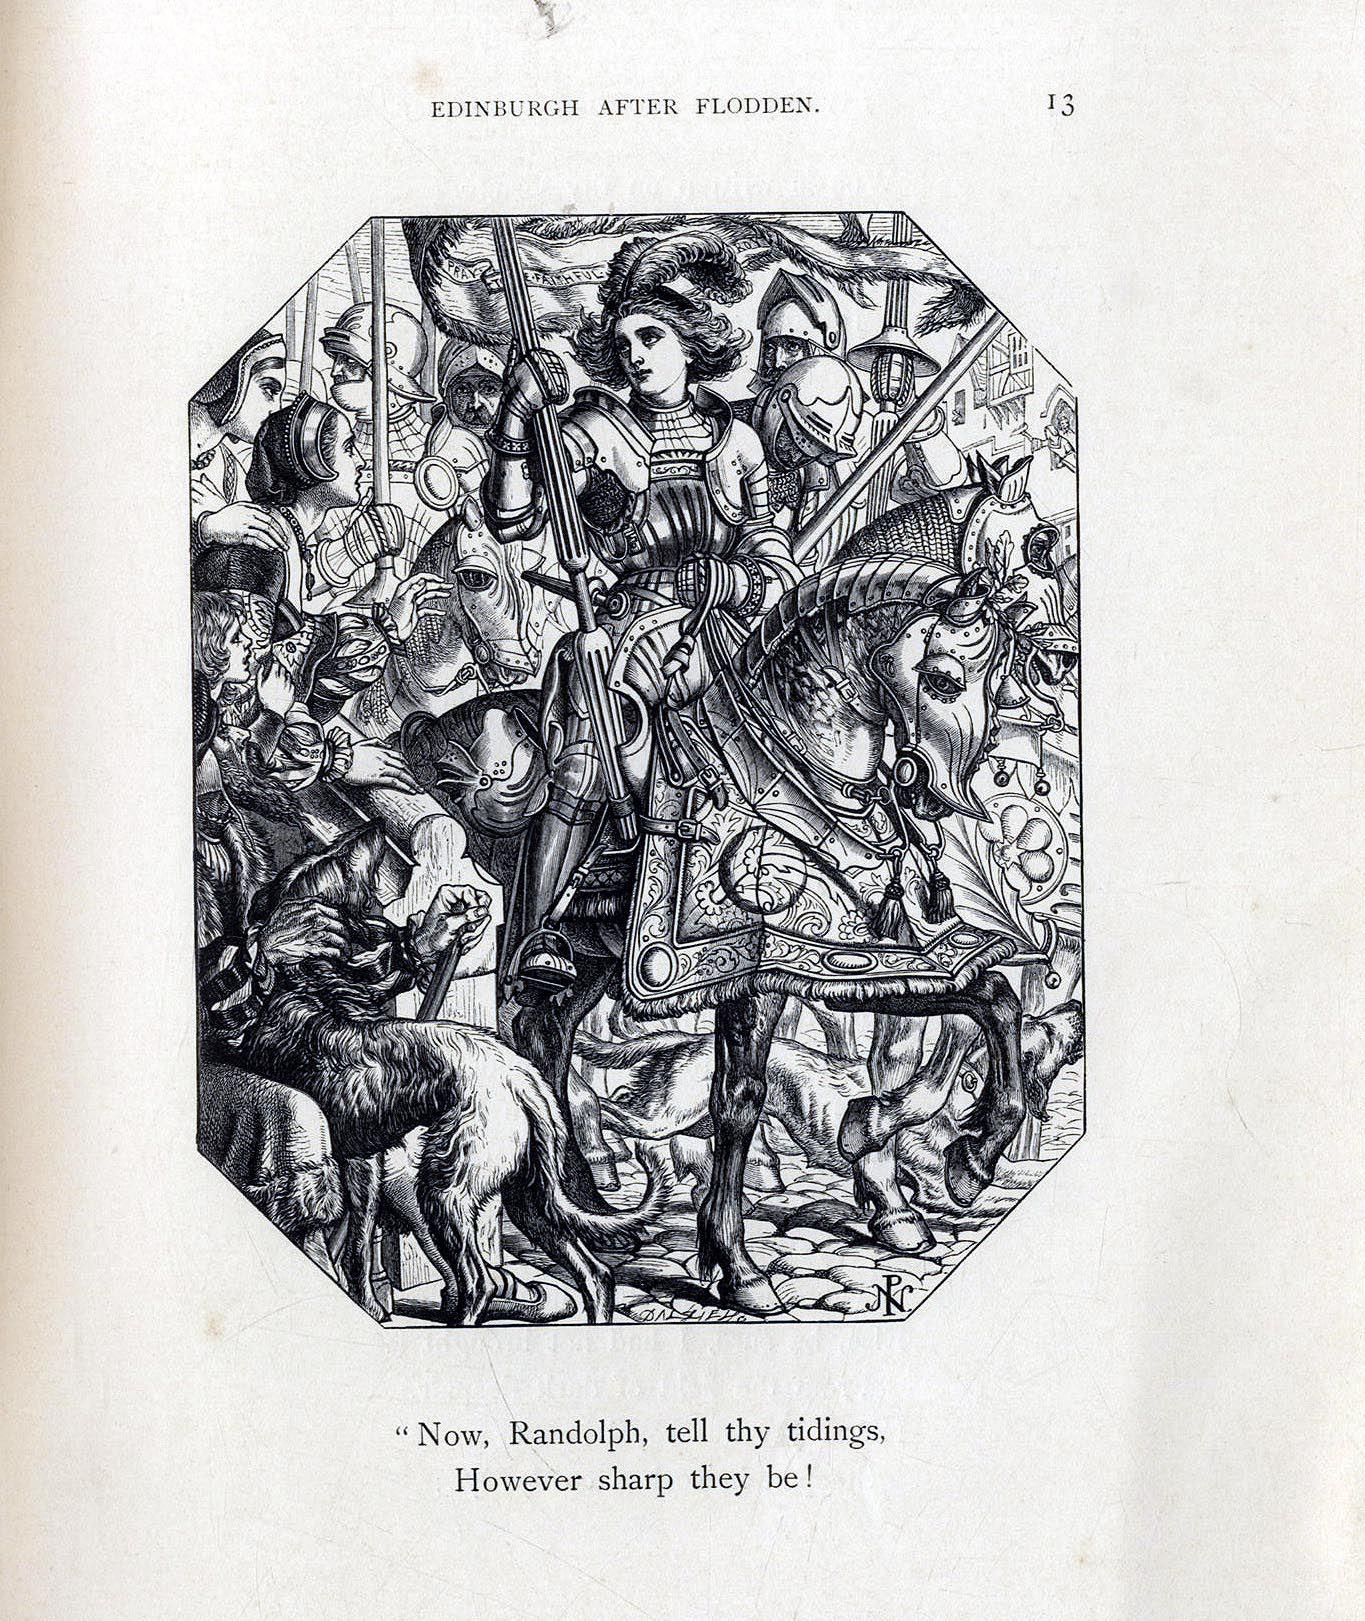 Ayton's Lays 1865 - Illustrated by Joseph Noel Paton